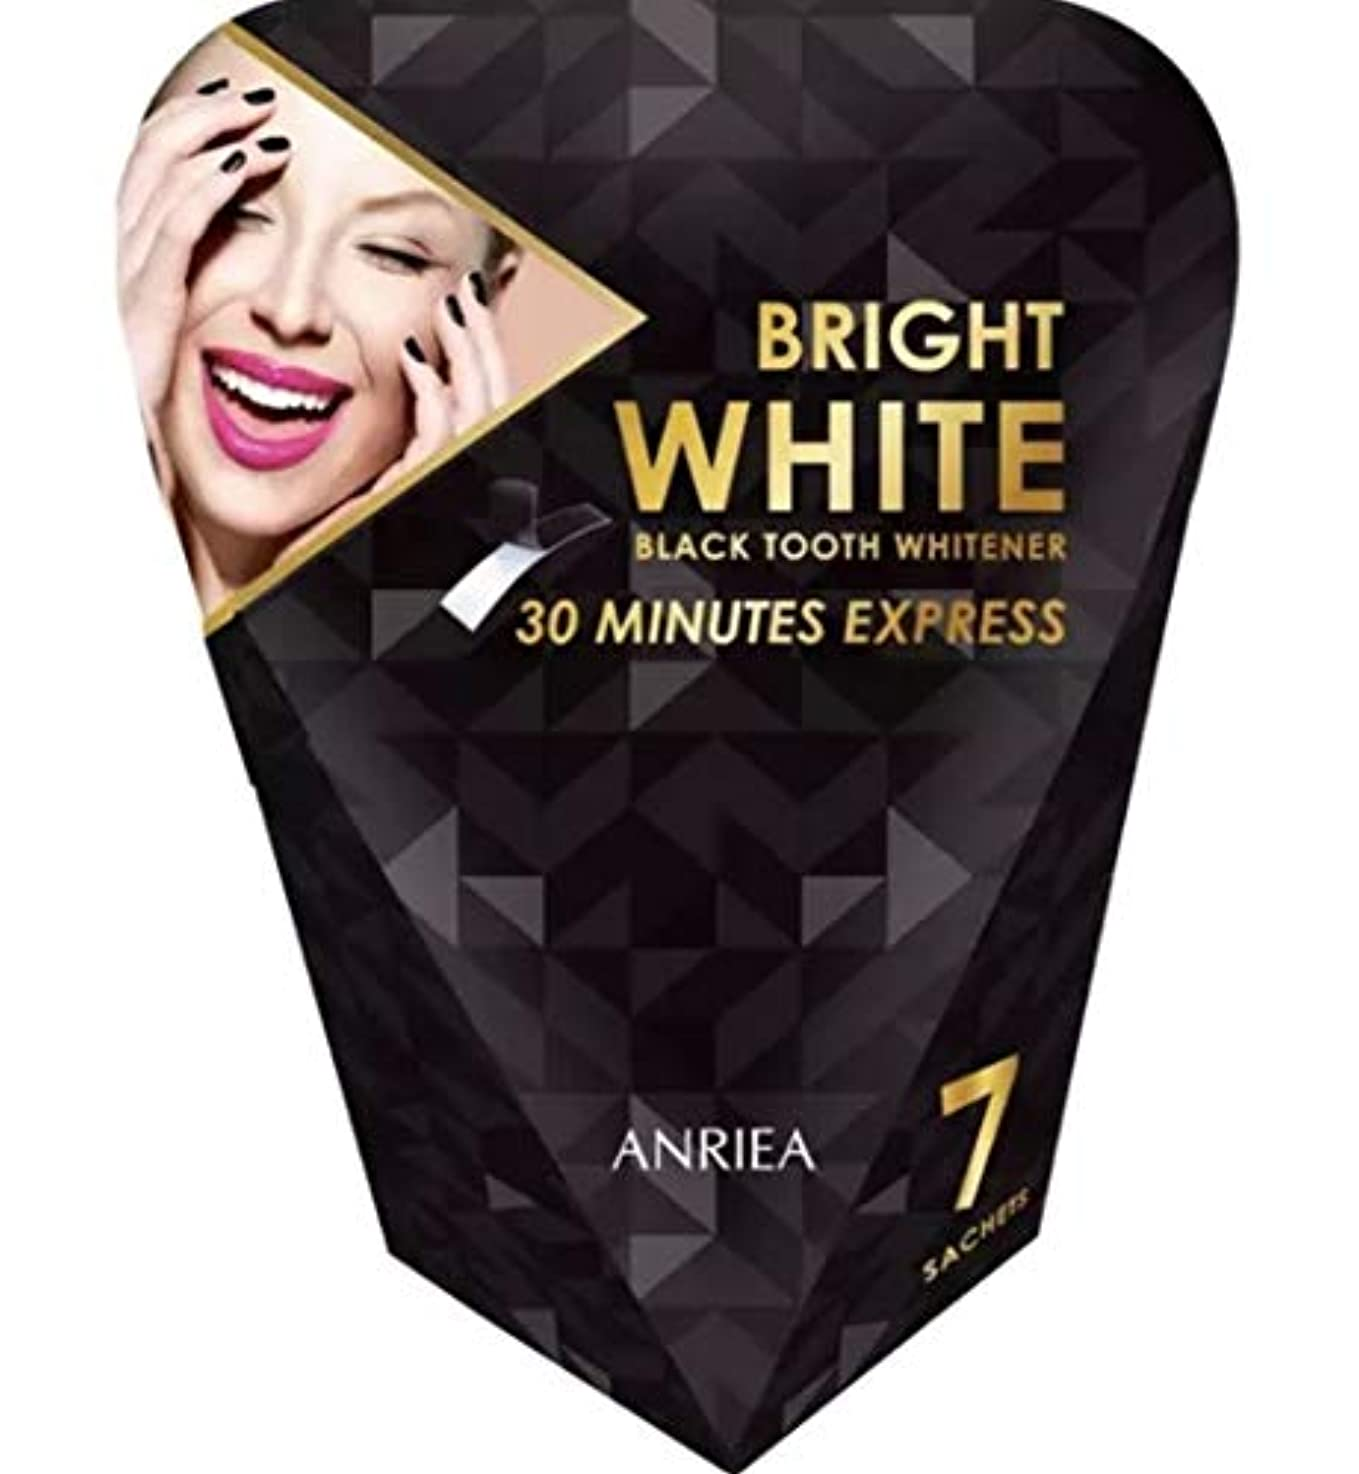 Anriea 3d white teeth Whitestrips Professional effect ANRIEA 3D ホワイトストリッププロフェッショナルエフェクト